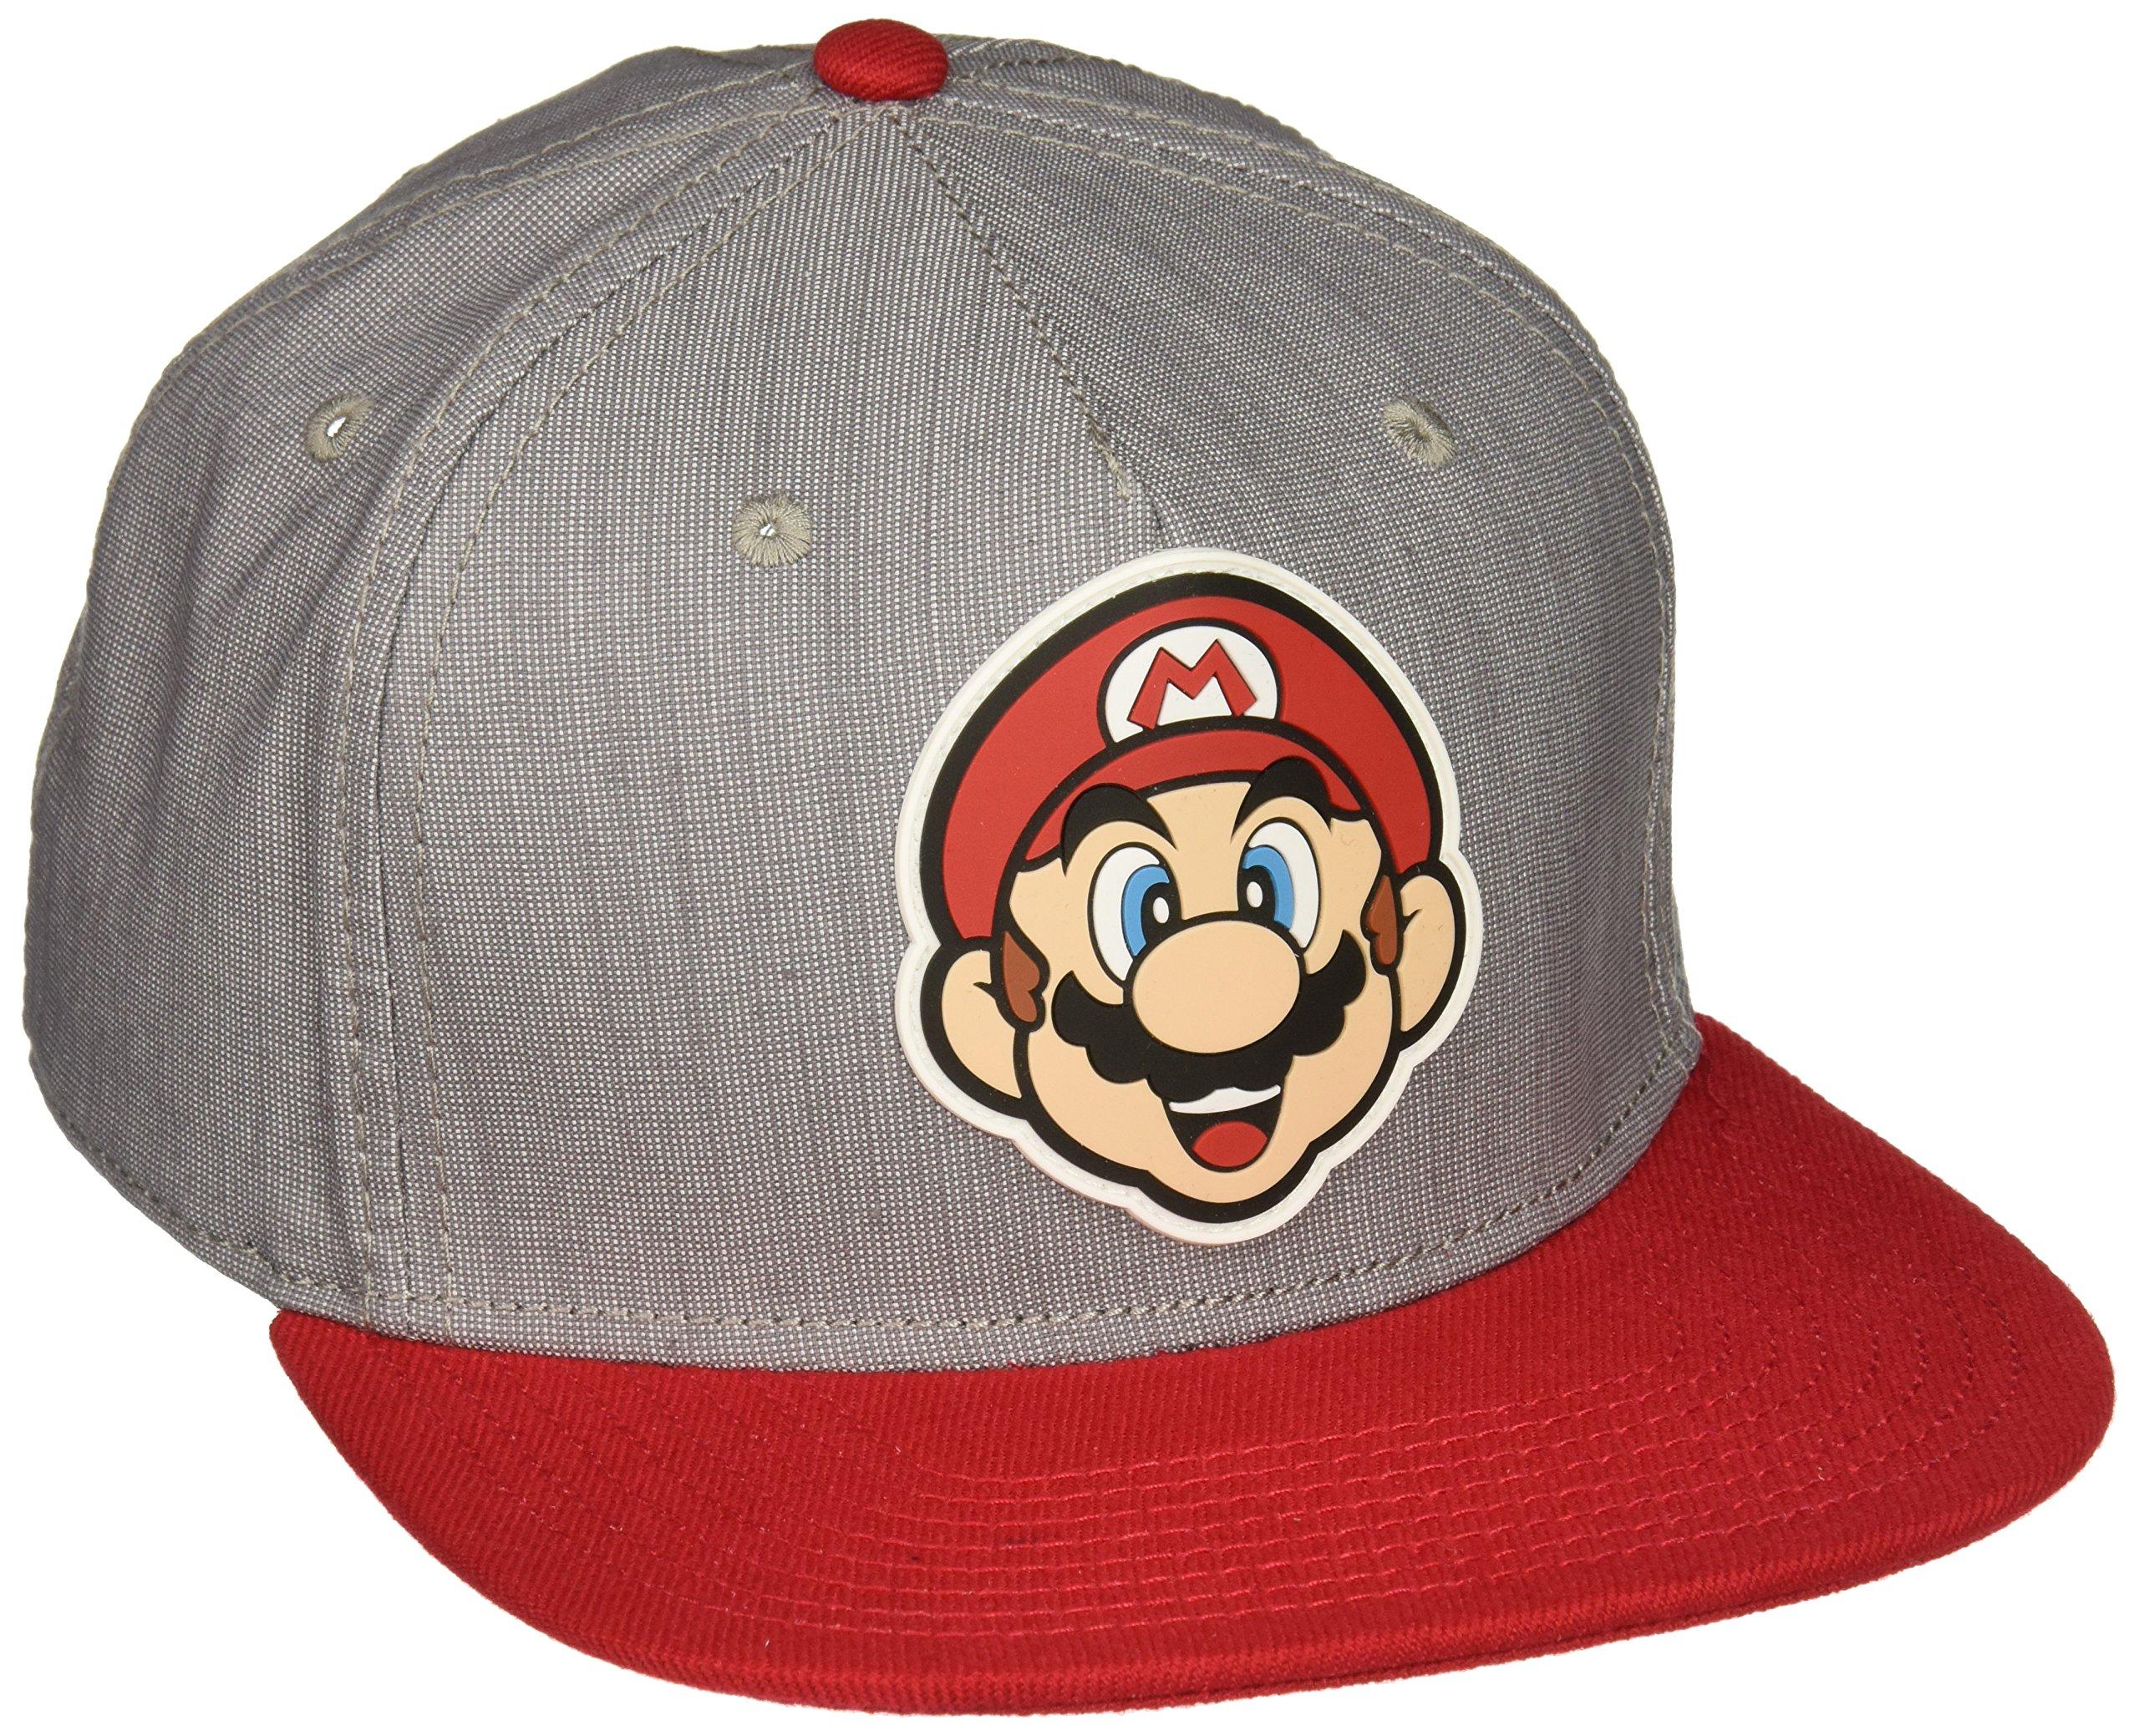 dbc14b5675408 Get Quotations · BIOWORLD Nintendo Super Mario Bros - Mario Rubber Logo Snapback  Cap